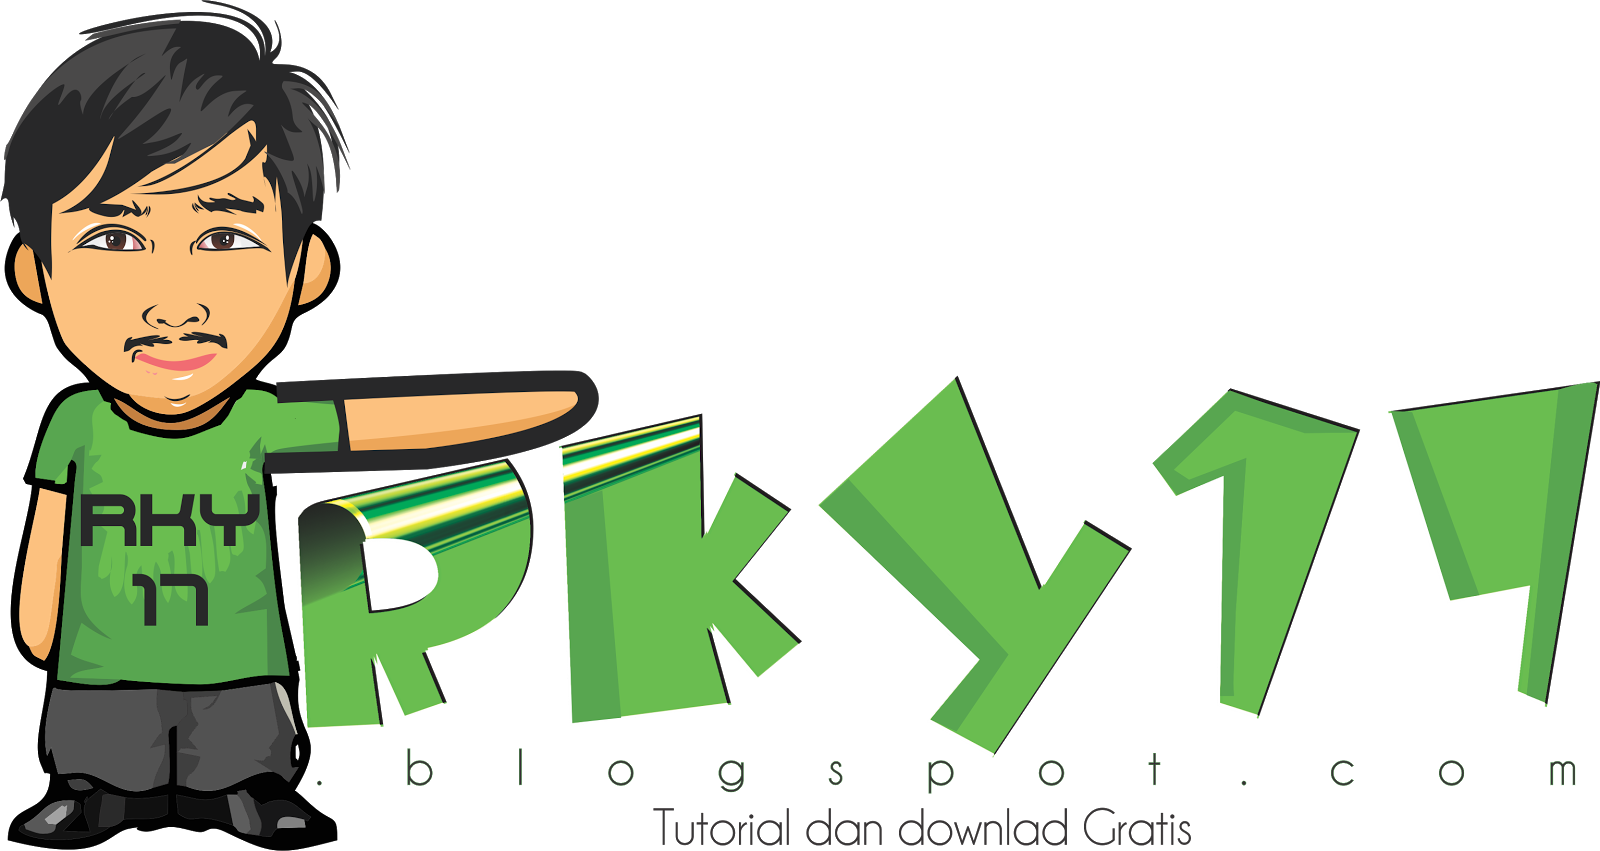 rky17.blogspot.com | Tutorial dan download gratis